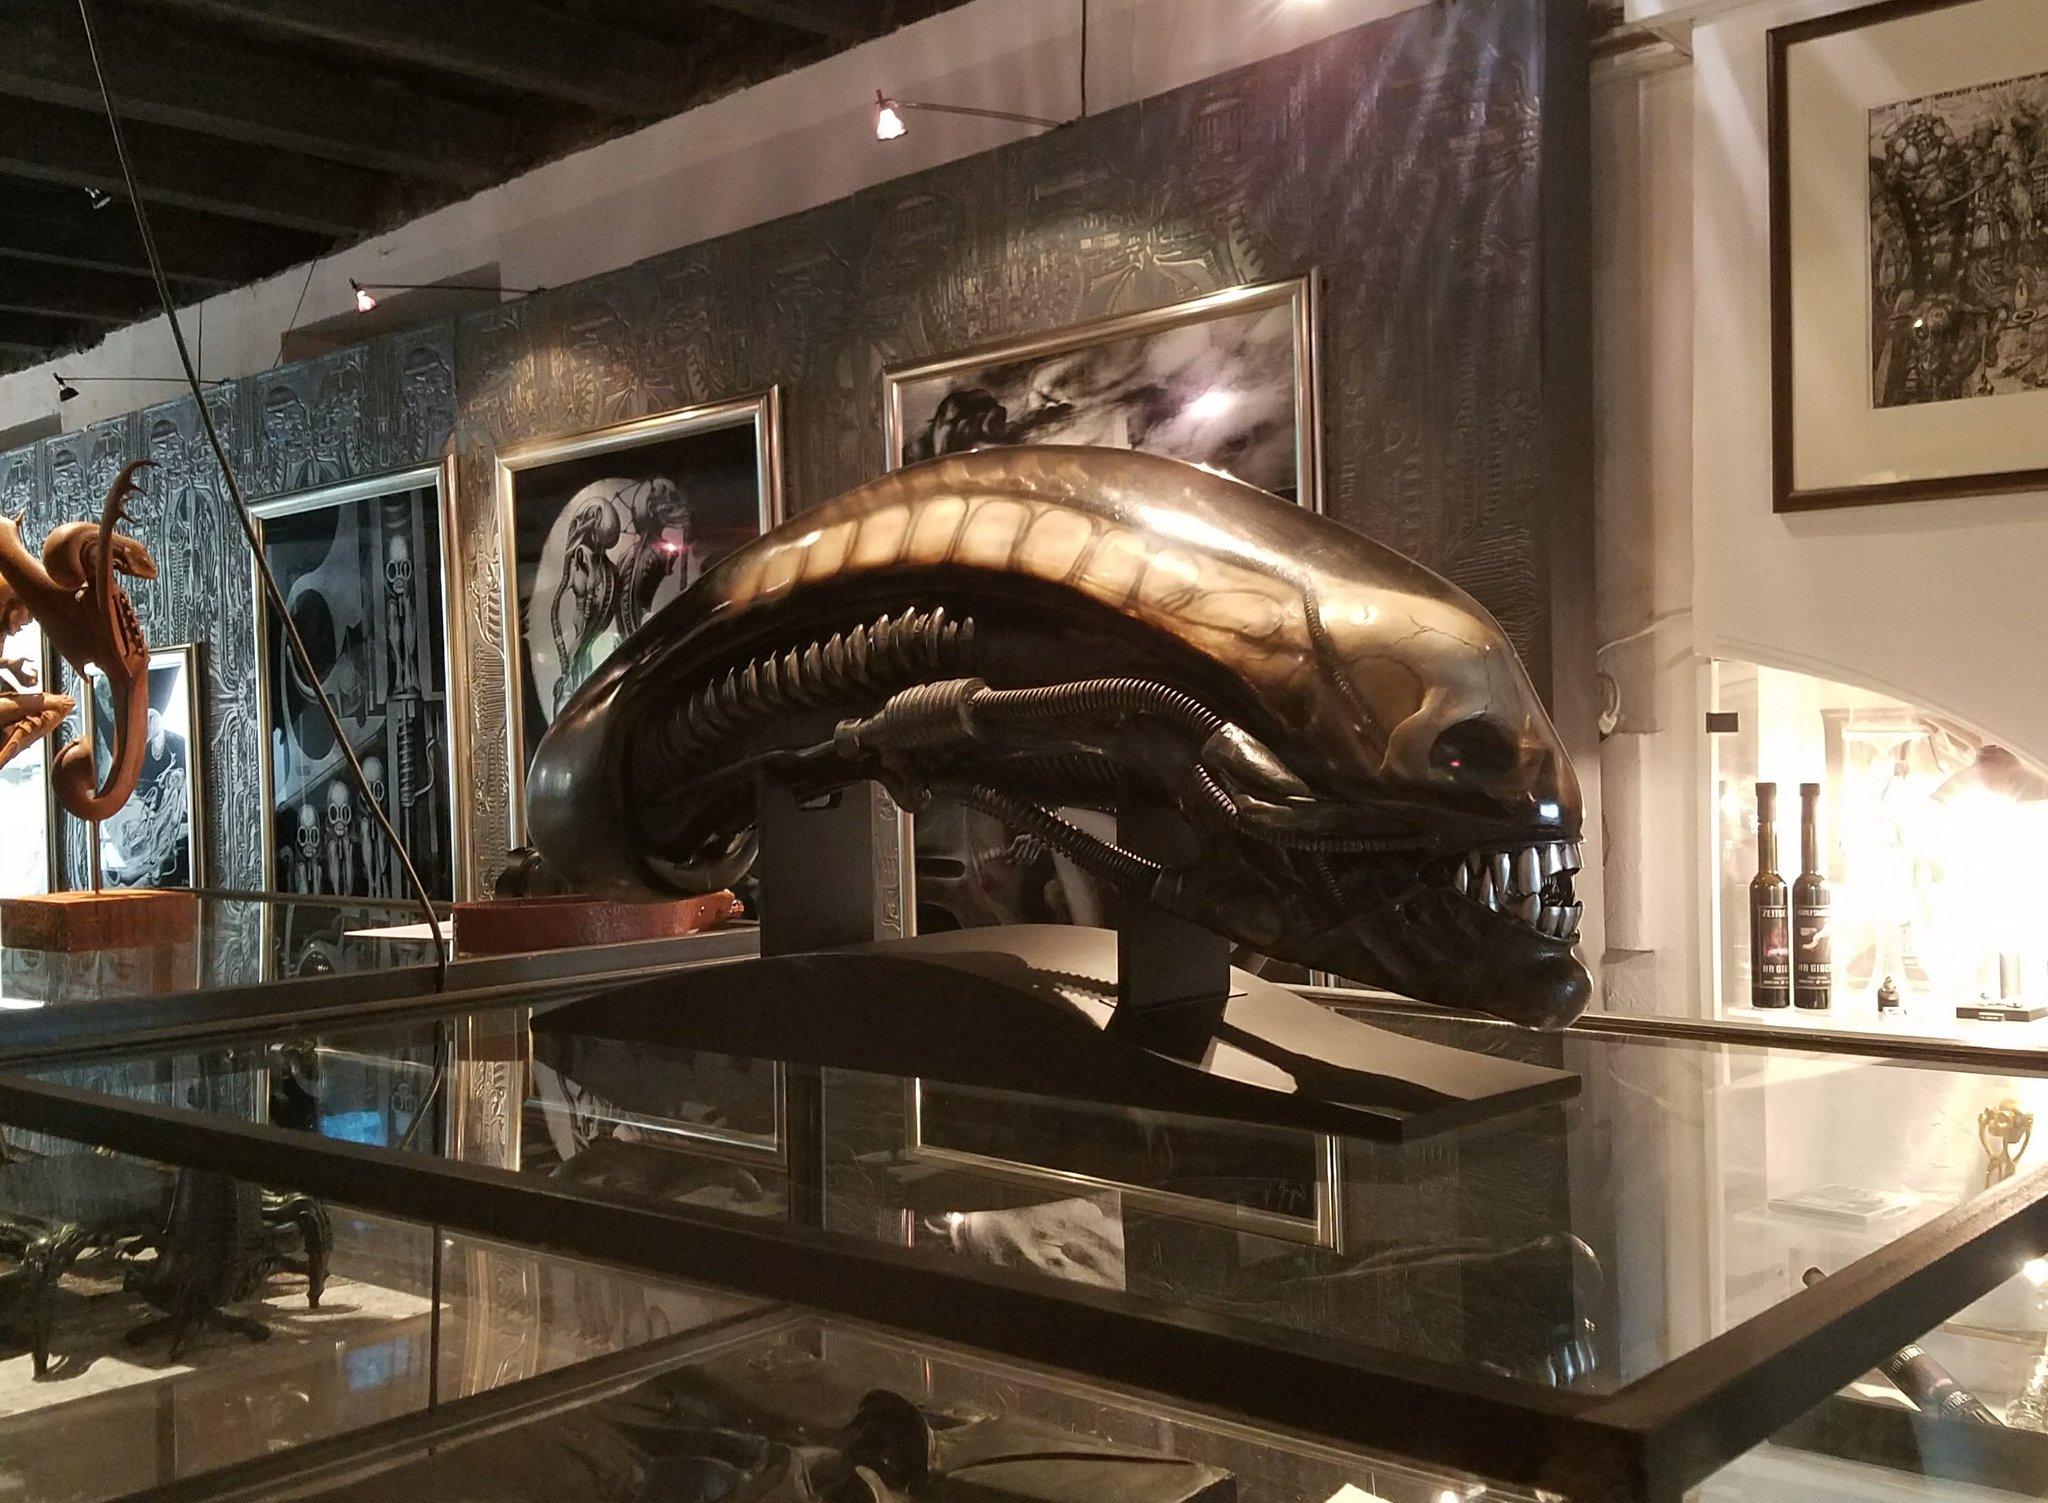 coolprops on twitter hr giger museum alien gigers alien life size head giger. Black Bedroom Furniture Sets. Home Design Ideas